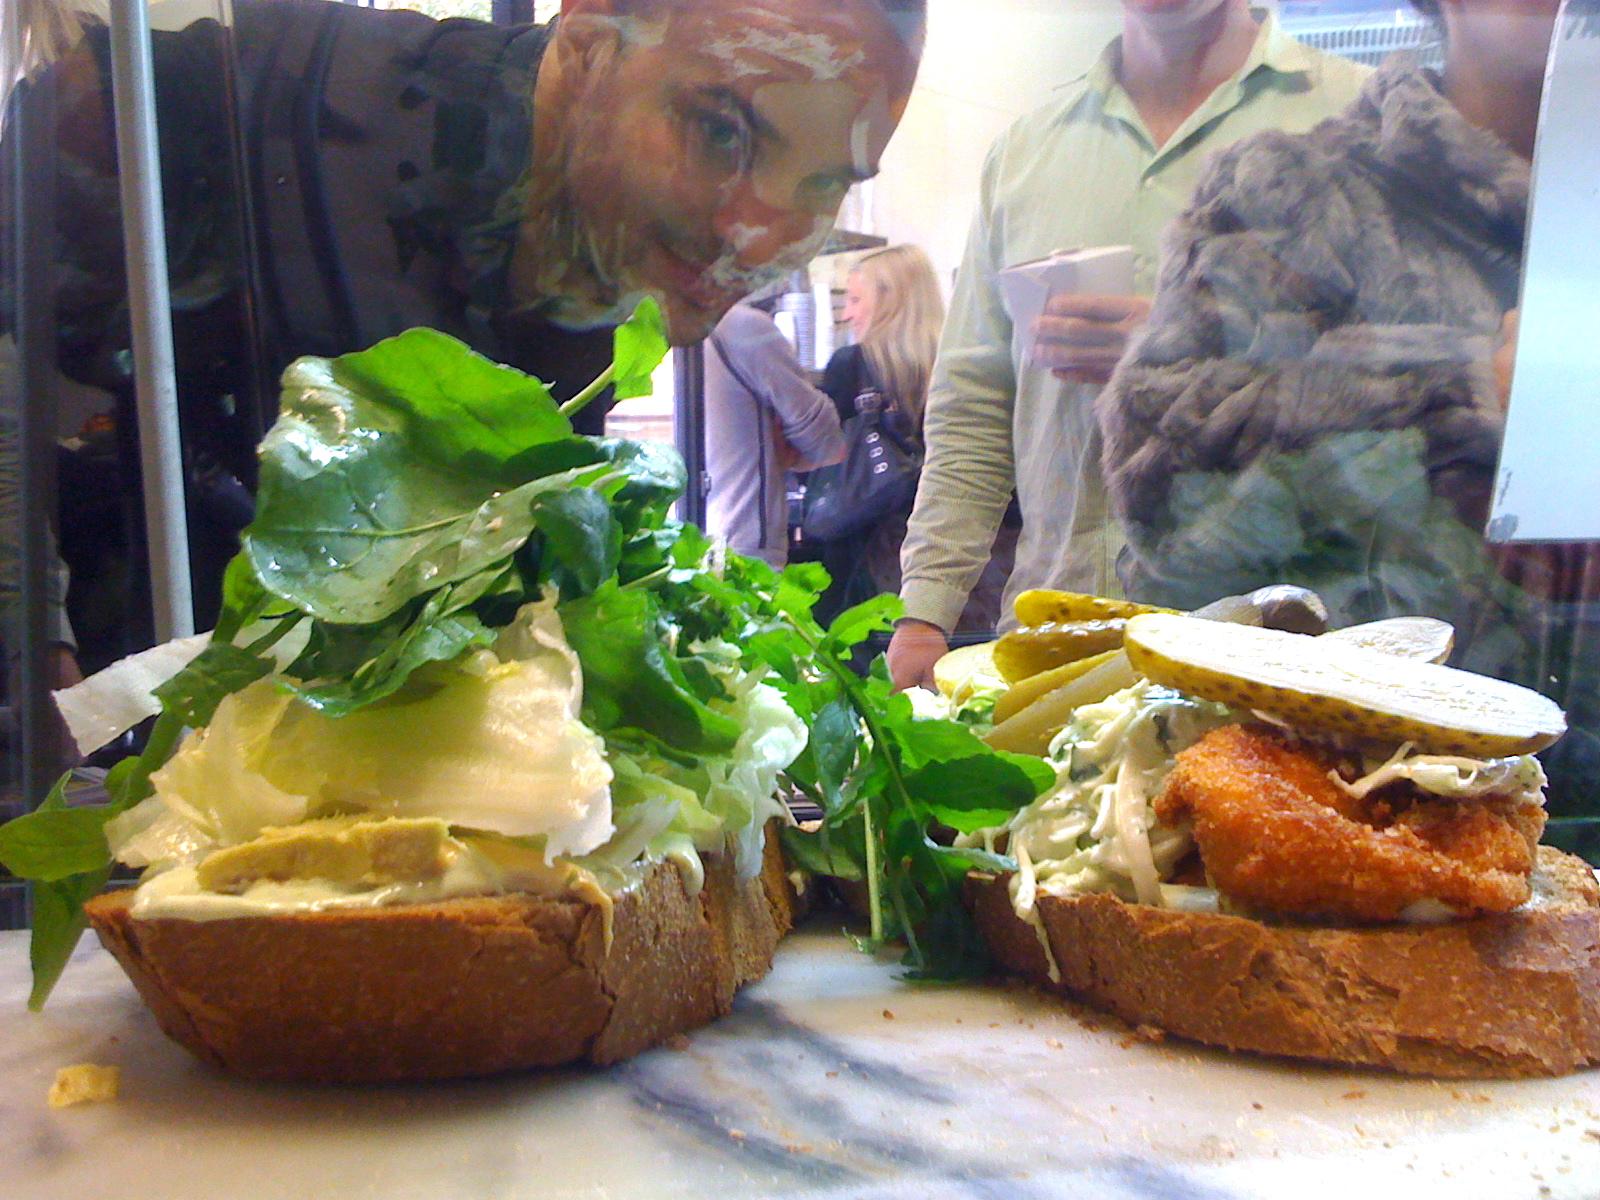 You've never had a sandwich like the one at Malibu Malibu Sandwich Bar before